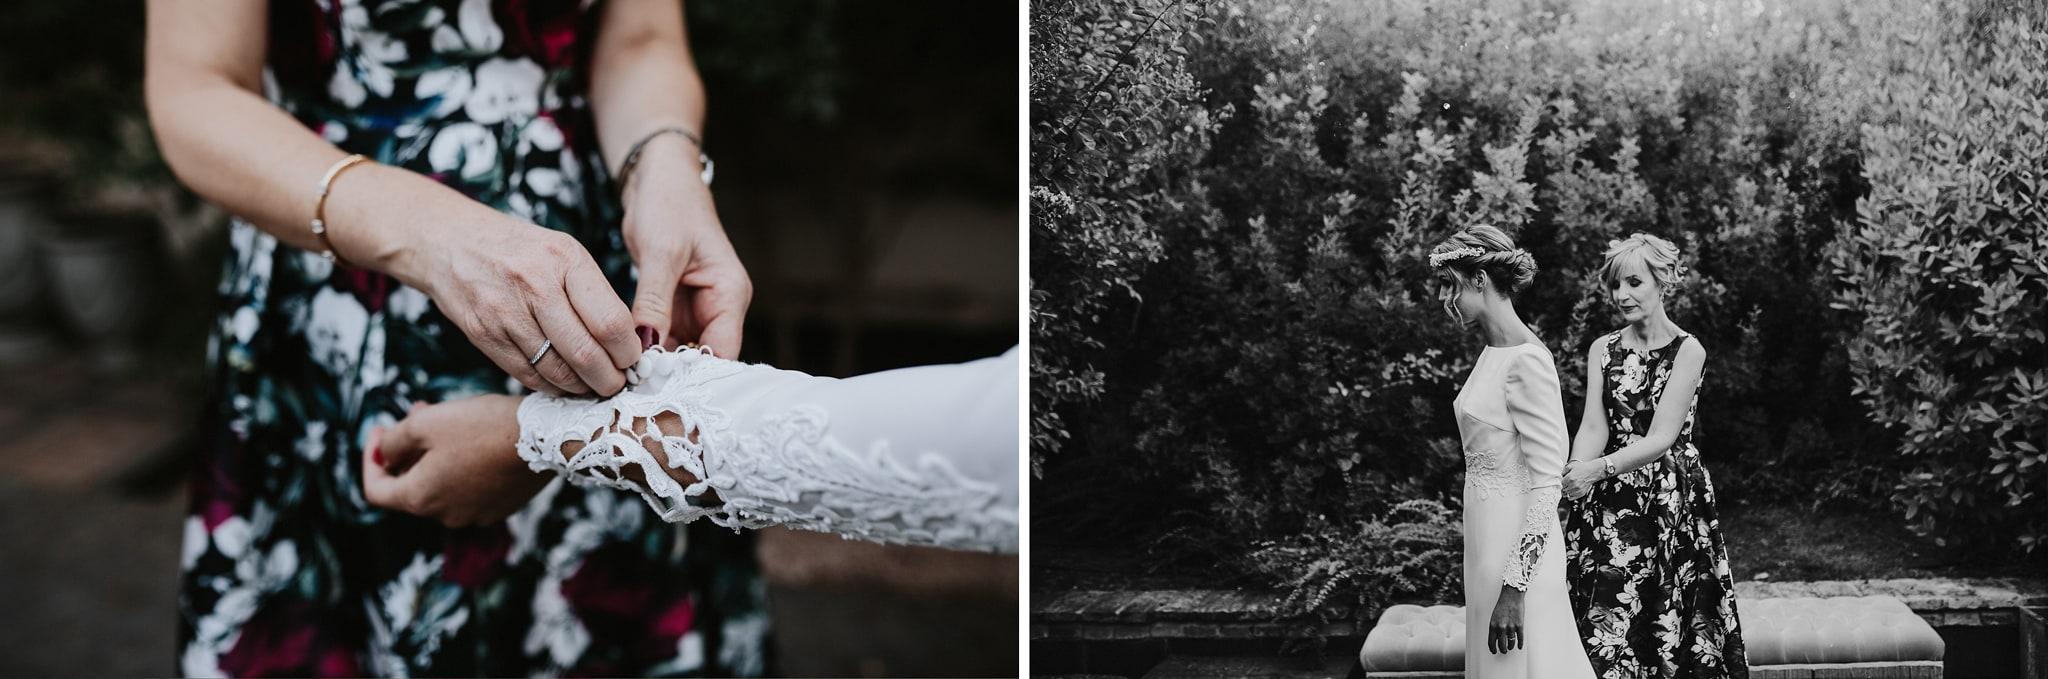 prisma-blanco-fotografos-bodas-toledo-49